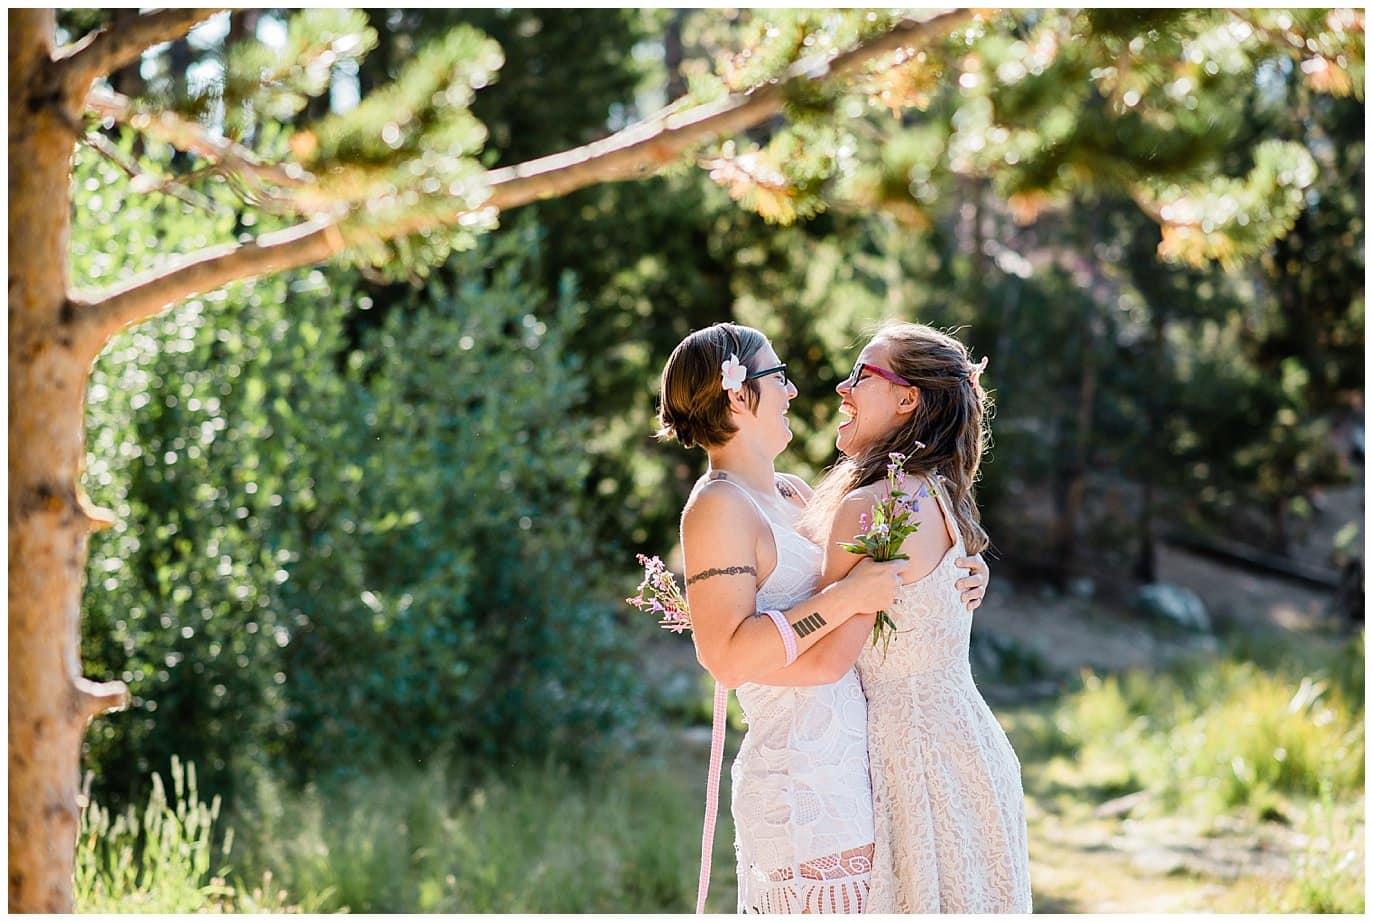 Summer hiking elopement photo